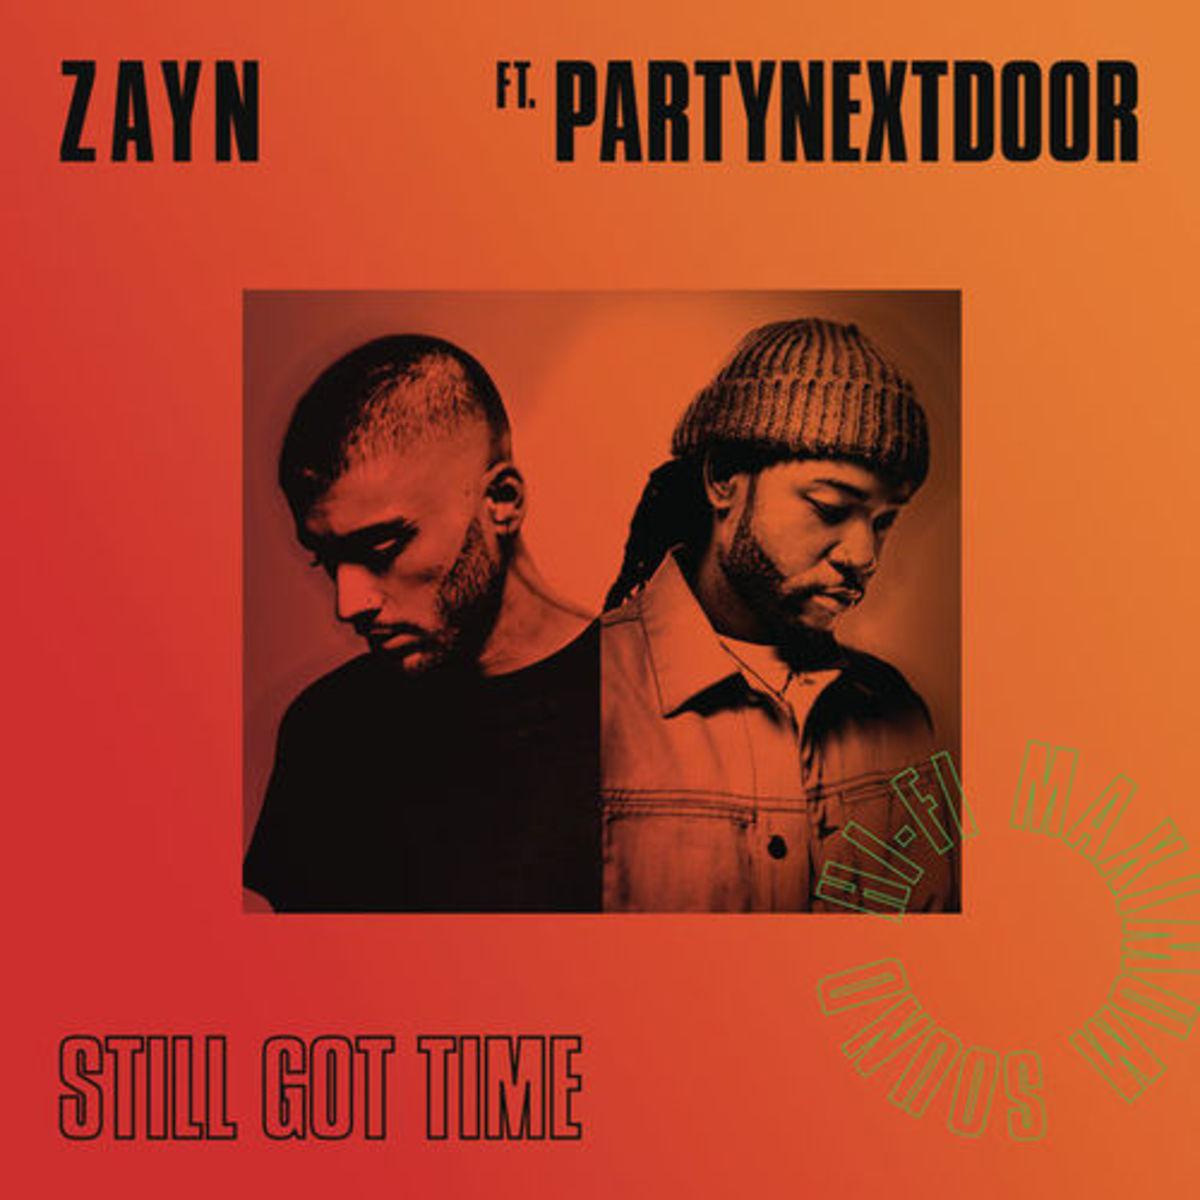 zayn-still-got-time.jpg